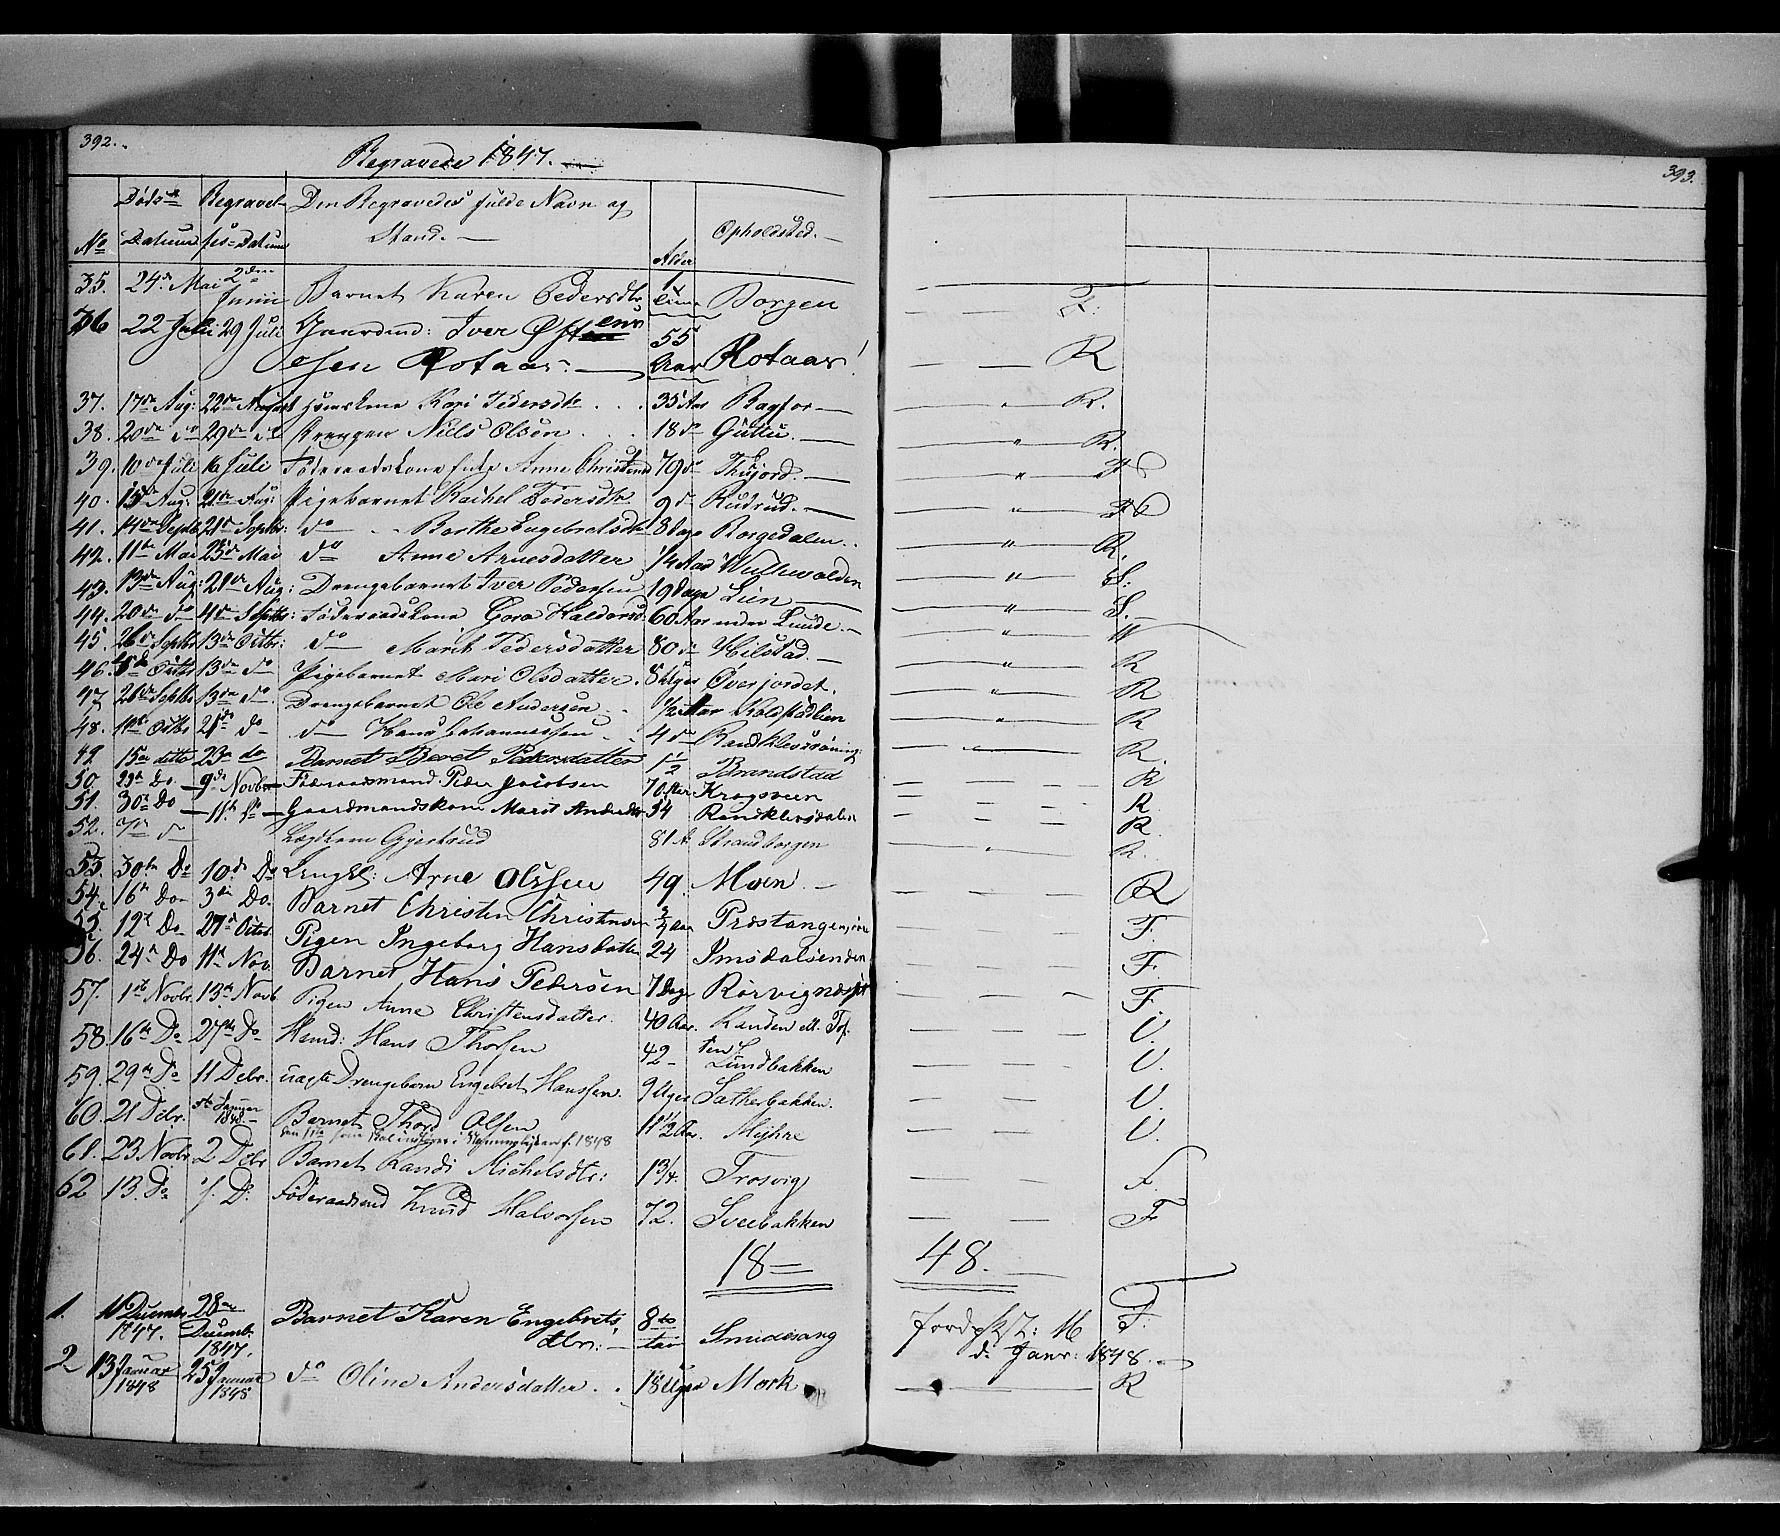 SAH, Ringebu prestekontor, Ministerialbok nr. 5, 1839-1848, s. 392-393